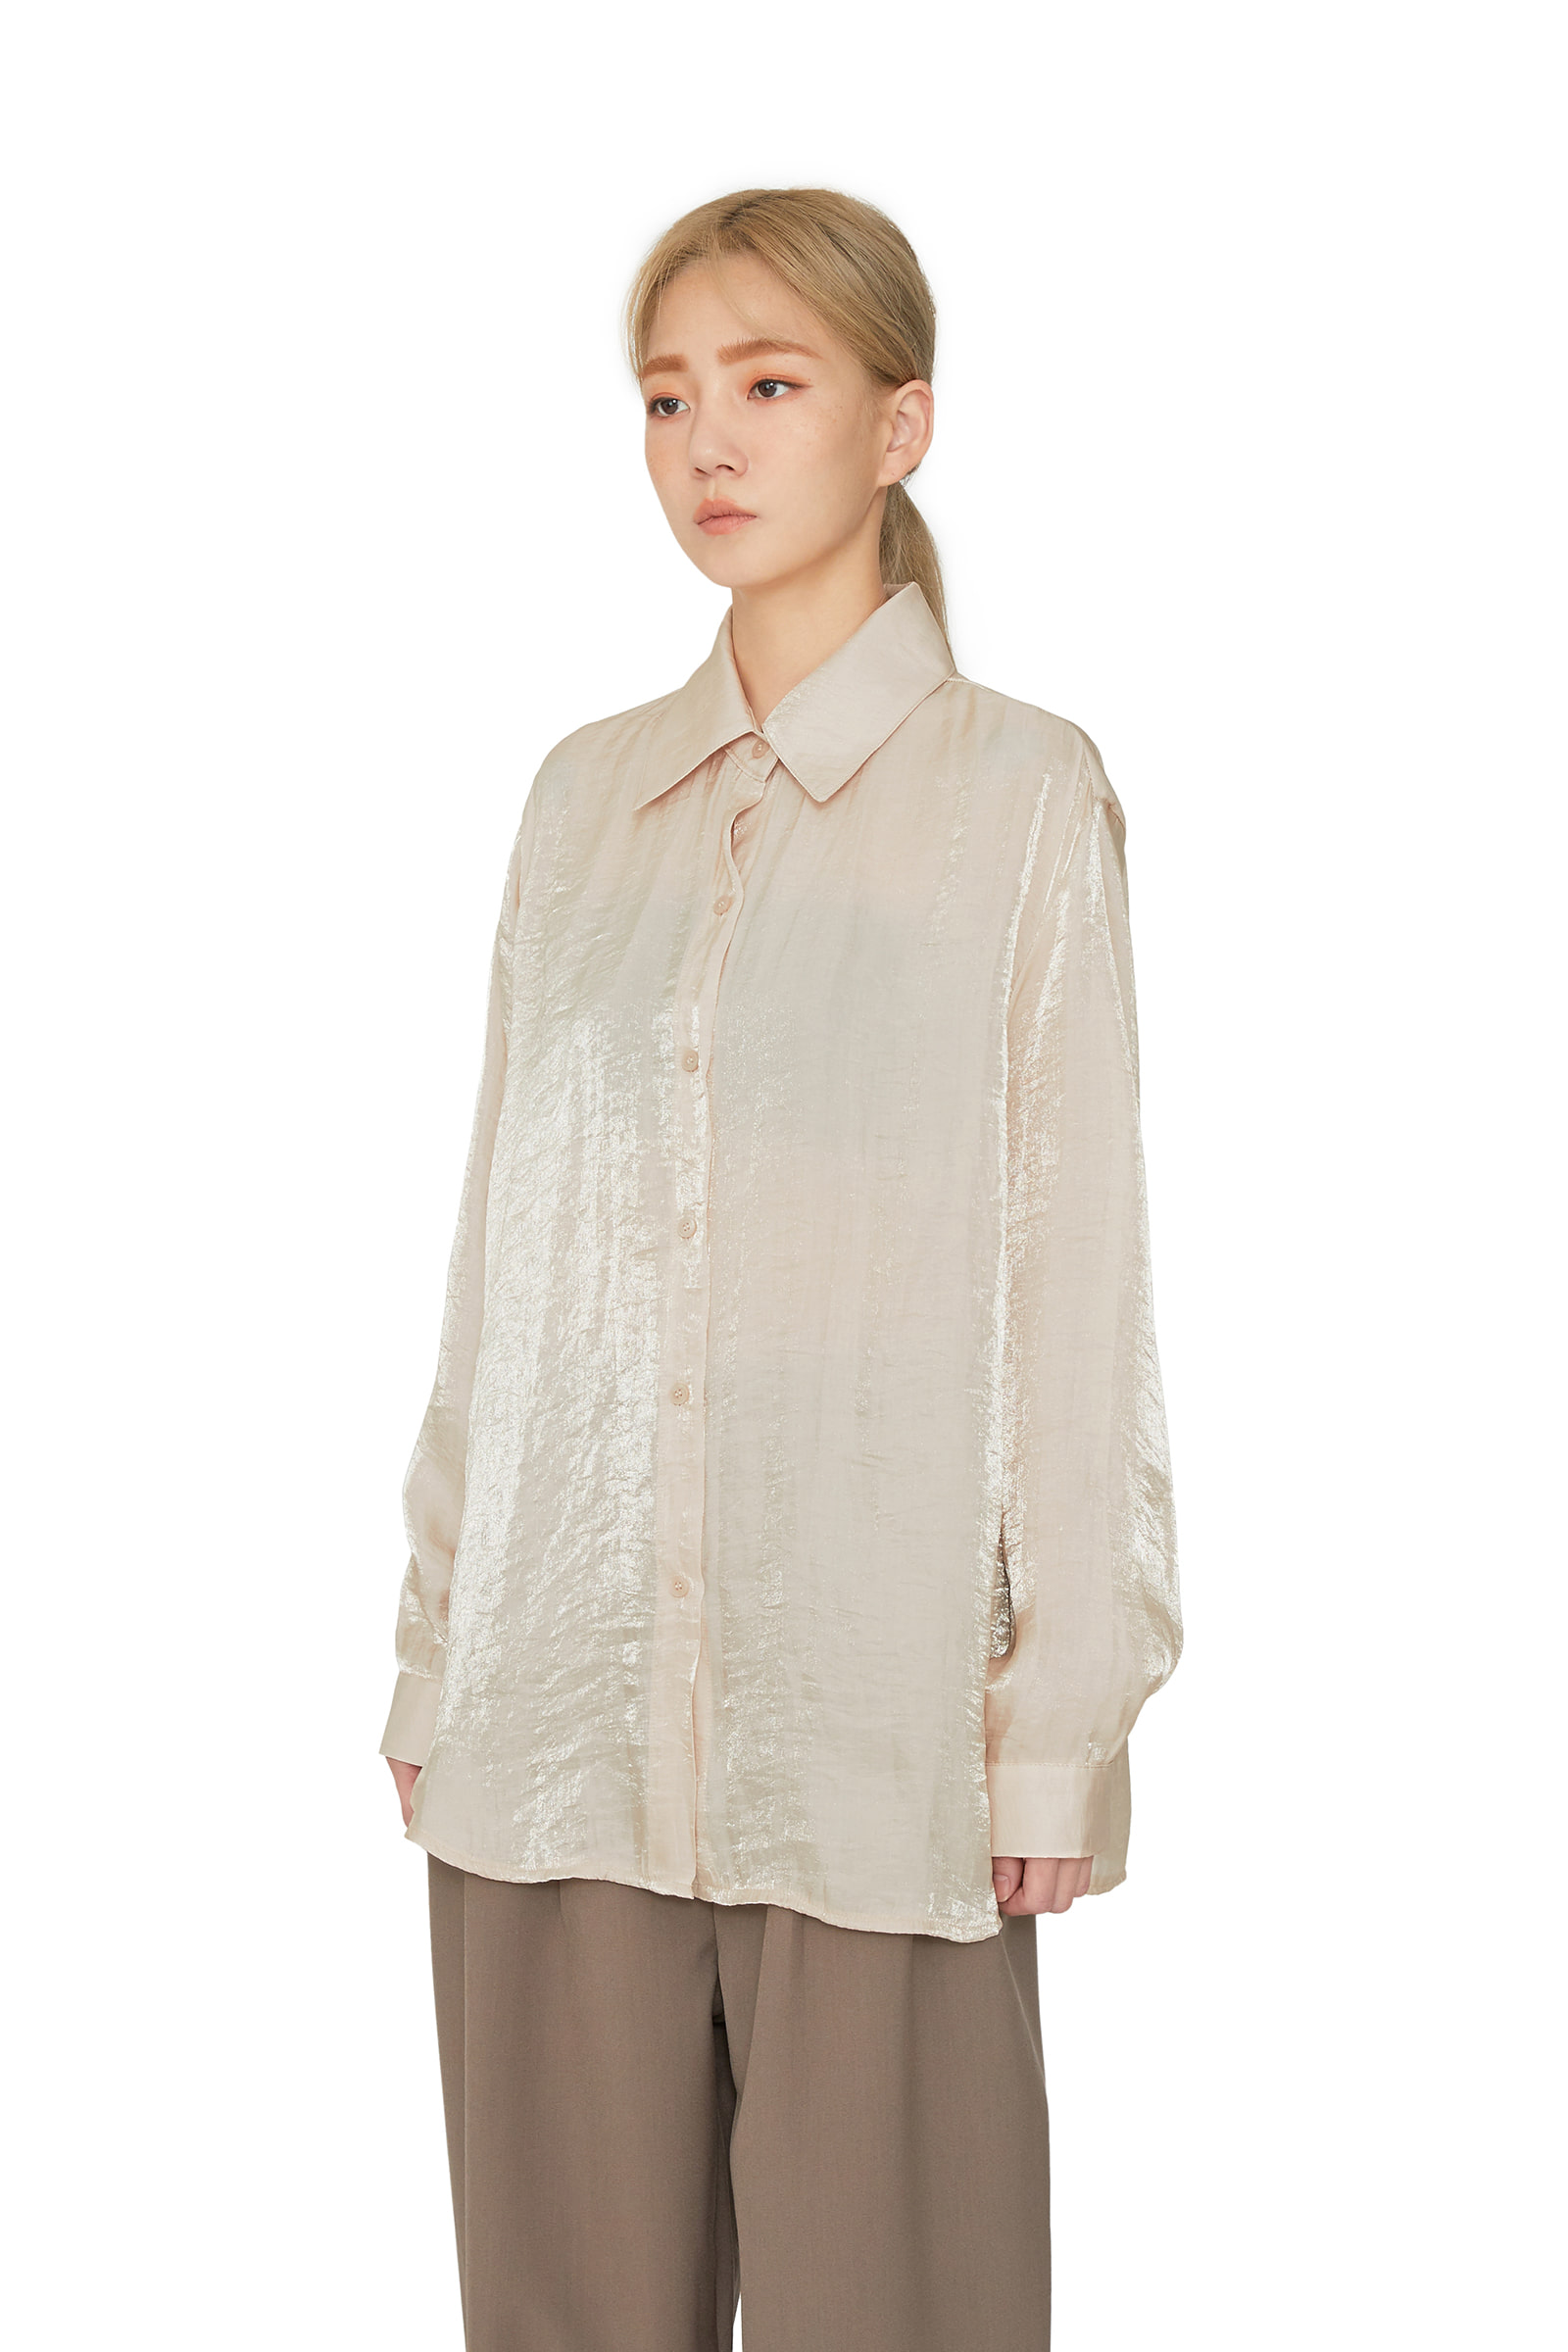 Bling satin standard shirt